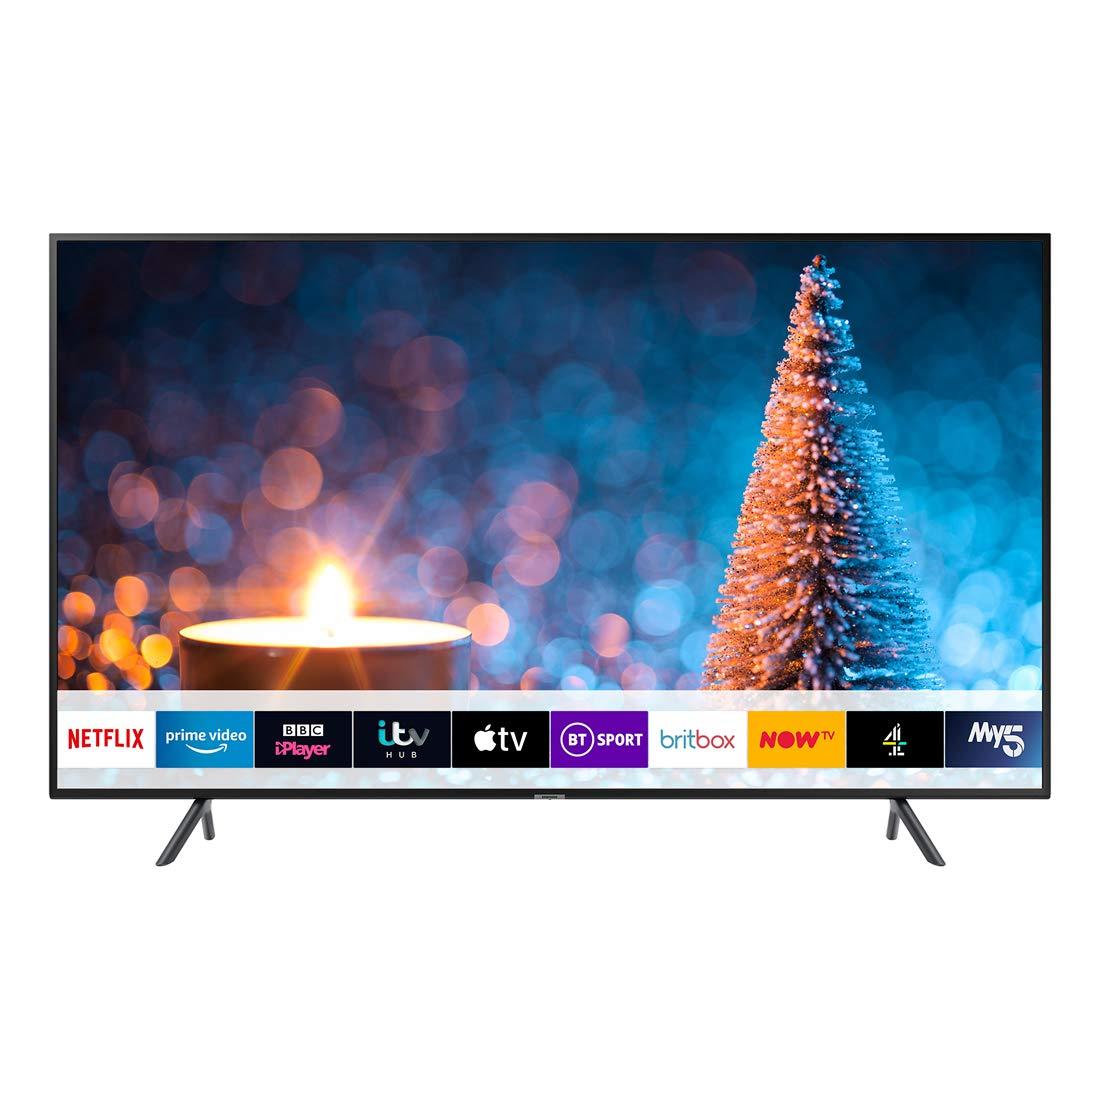 Samsung 75-inch RU7100 HDR Smart 4K TV [Energy Class A+] £970 @ Amazon